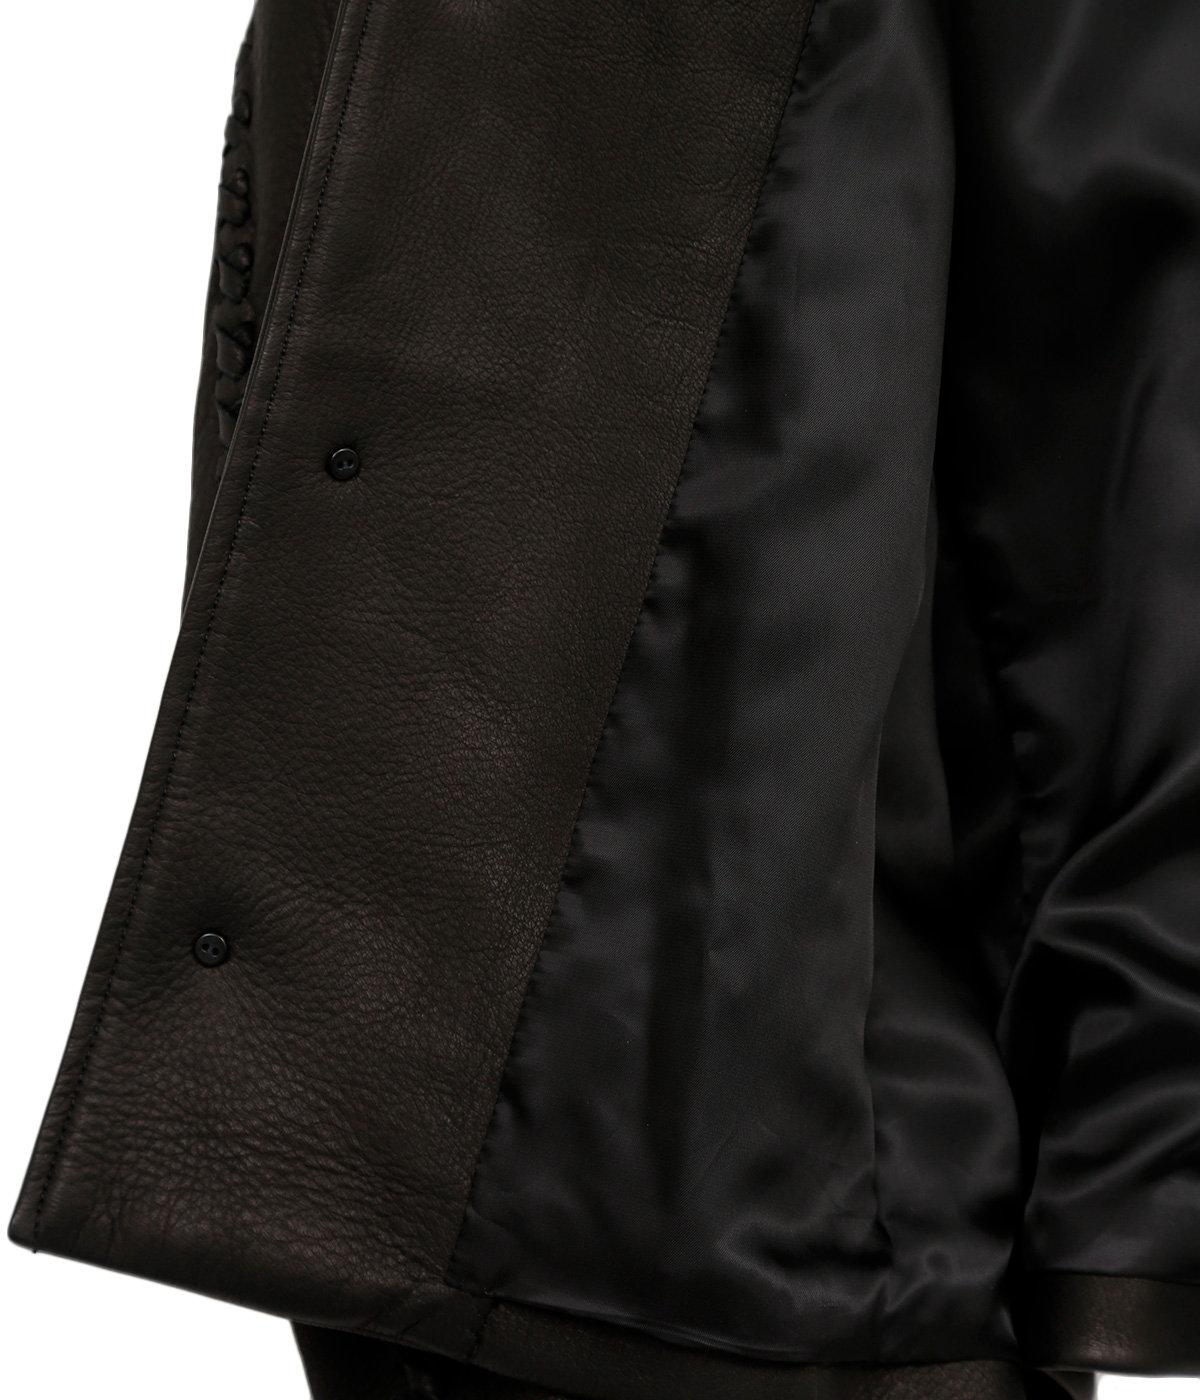 Hand Stitch Leather jacket